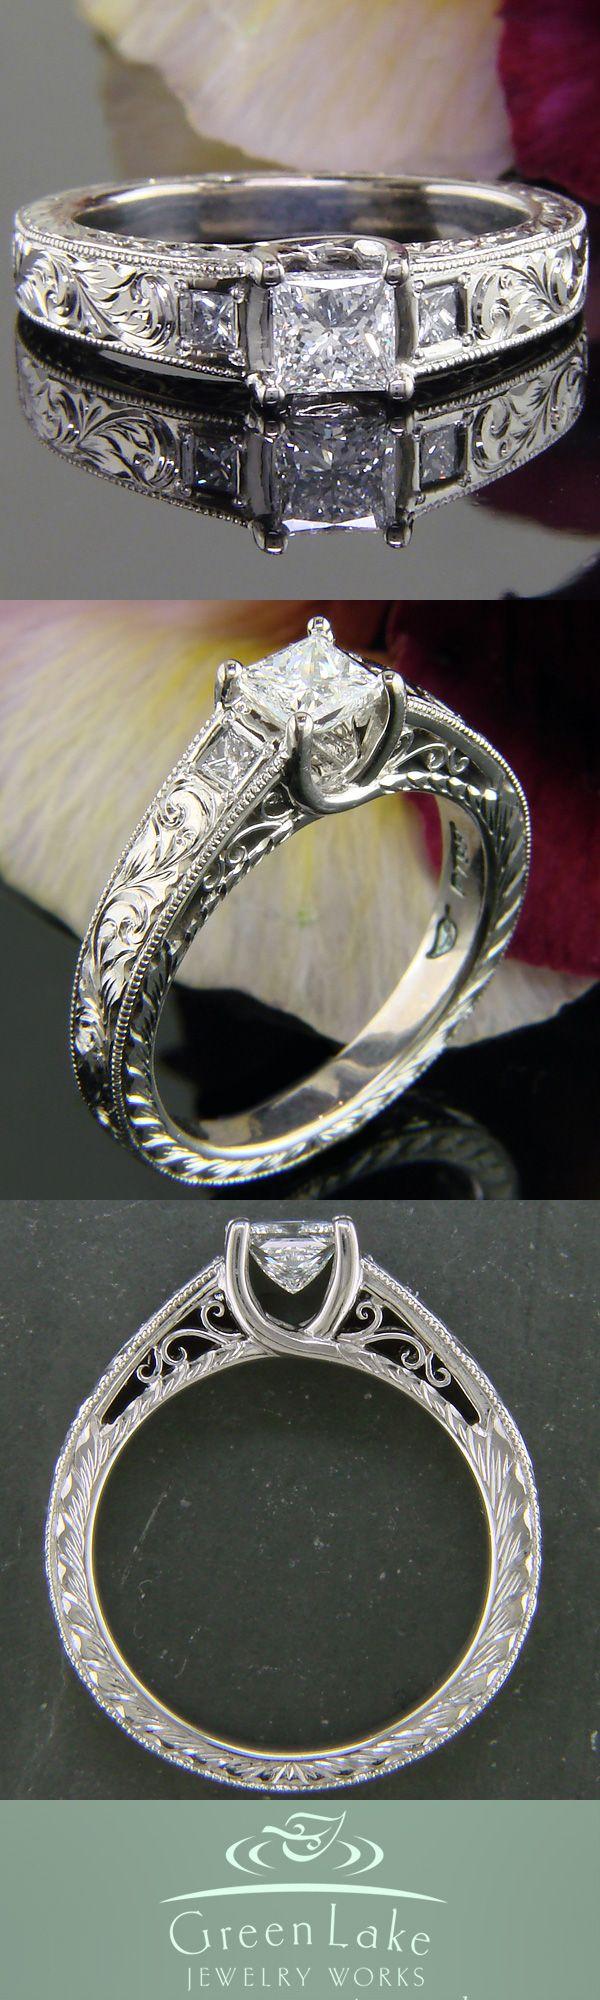 Best 25+ Western engagement rings ideas on Pinterest | Western ...